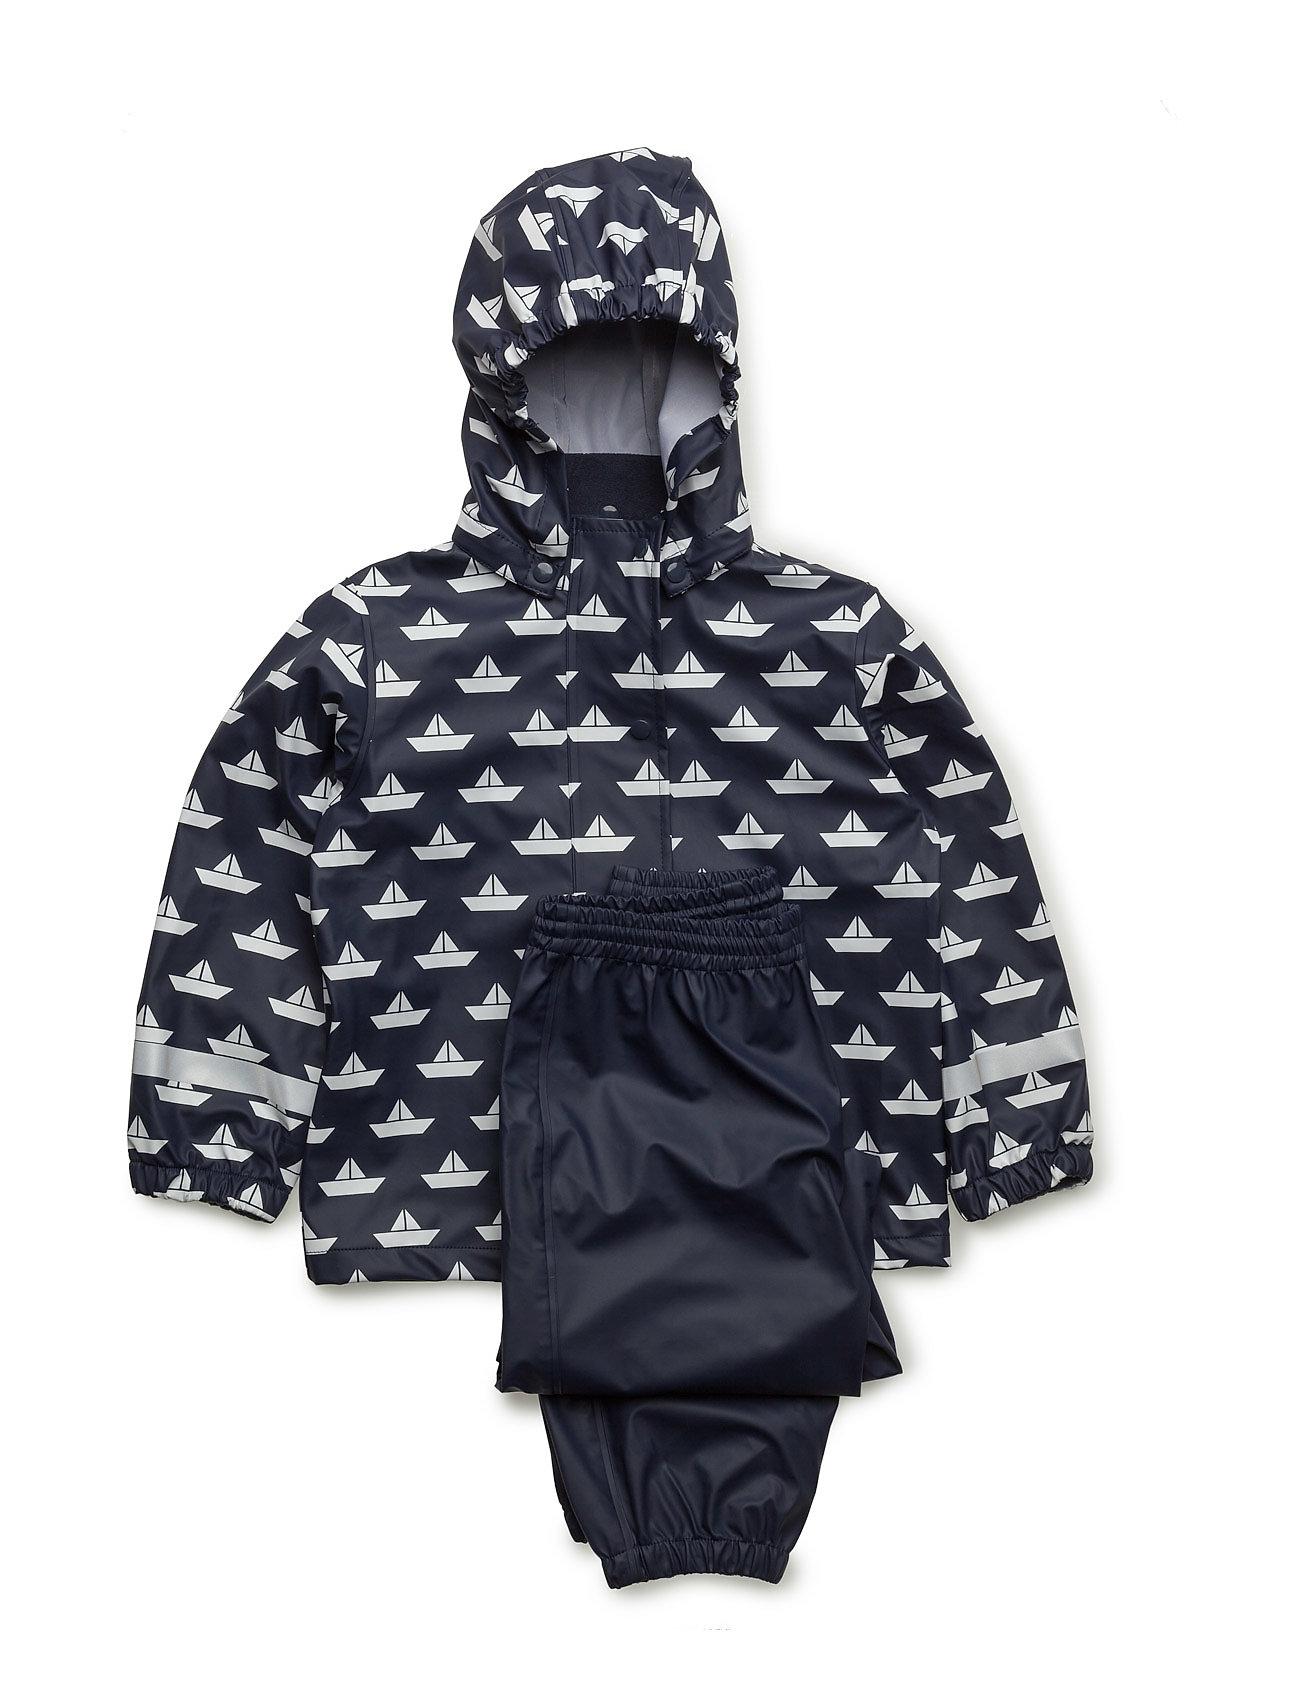 Rainwear Set Freds World Regntøj til Børn i Navy blå